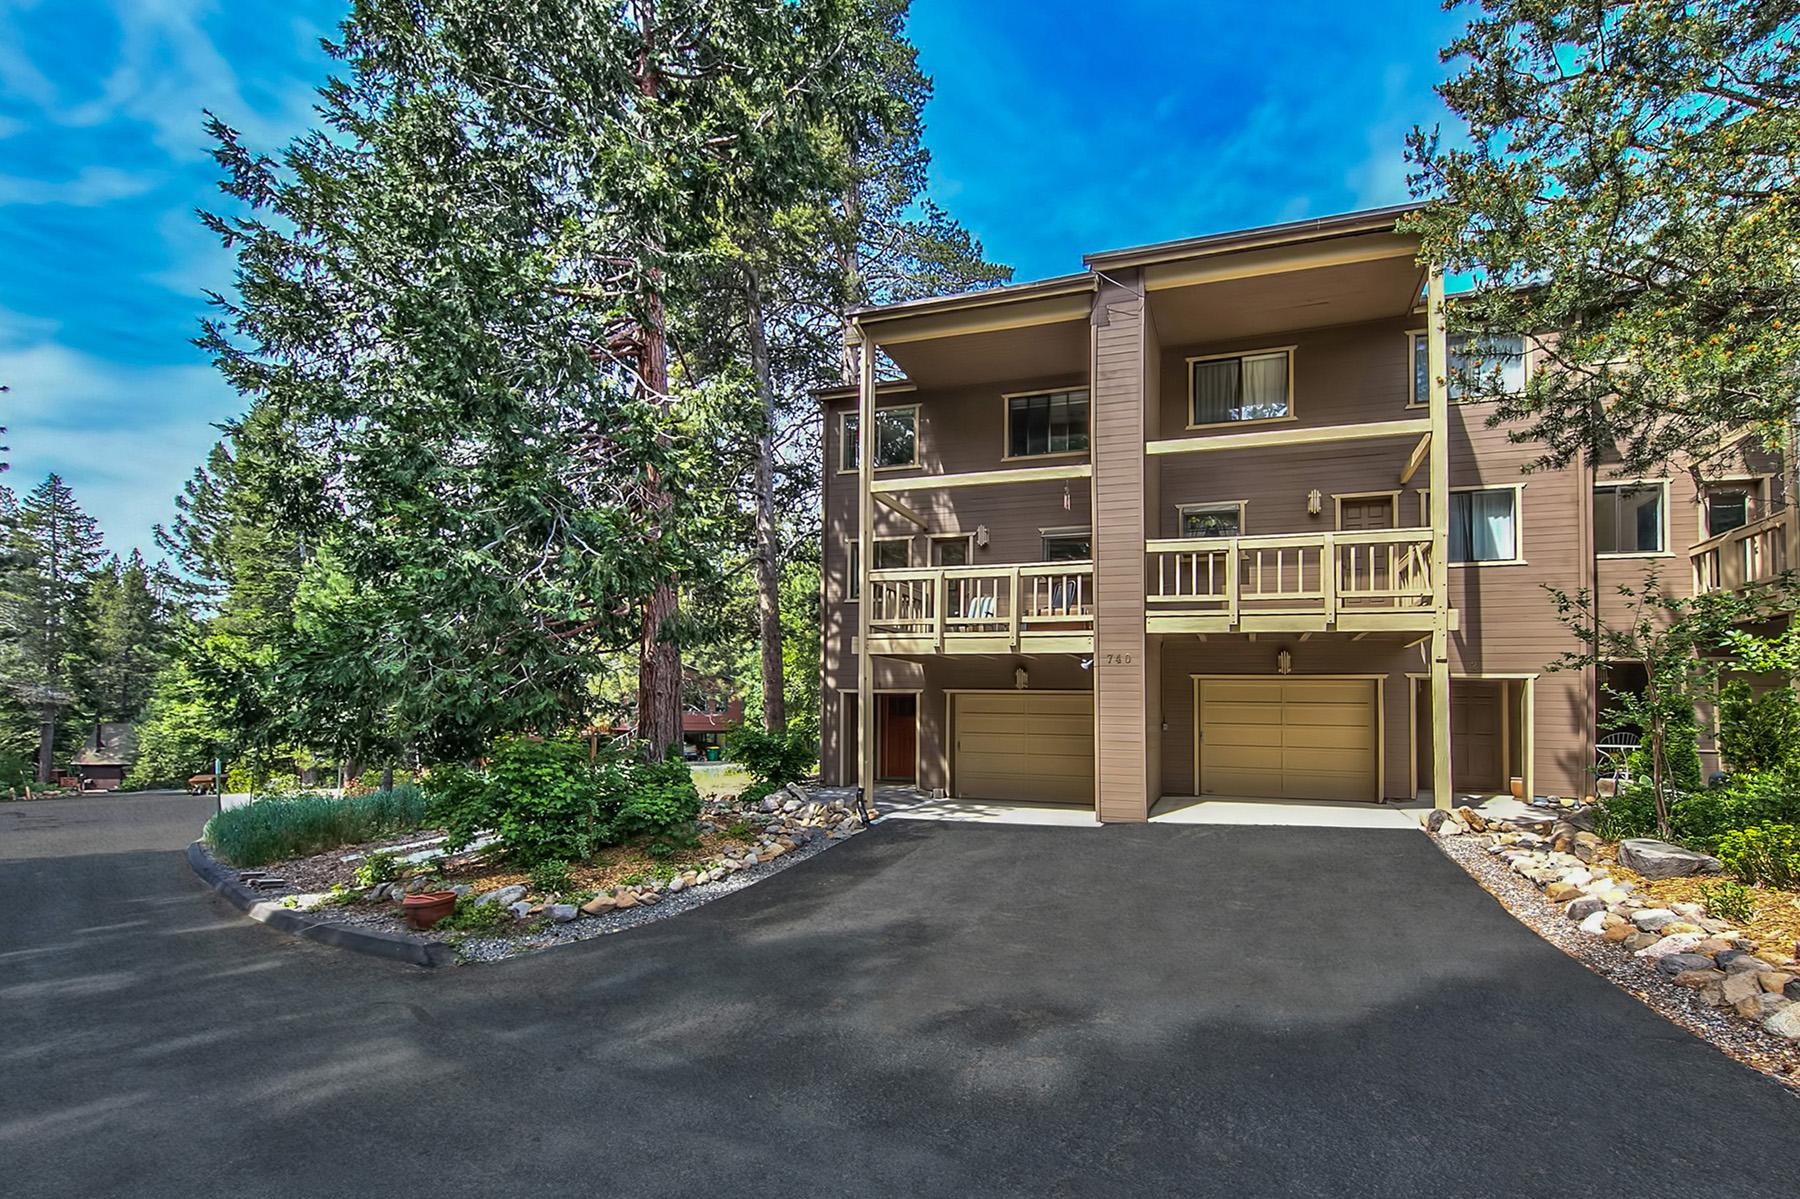 Condominium for Sale at 740 Crosby Court #1 Incline Village, Nevada 89451 United States